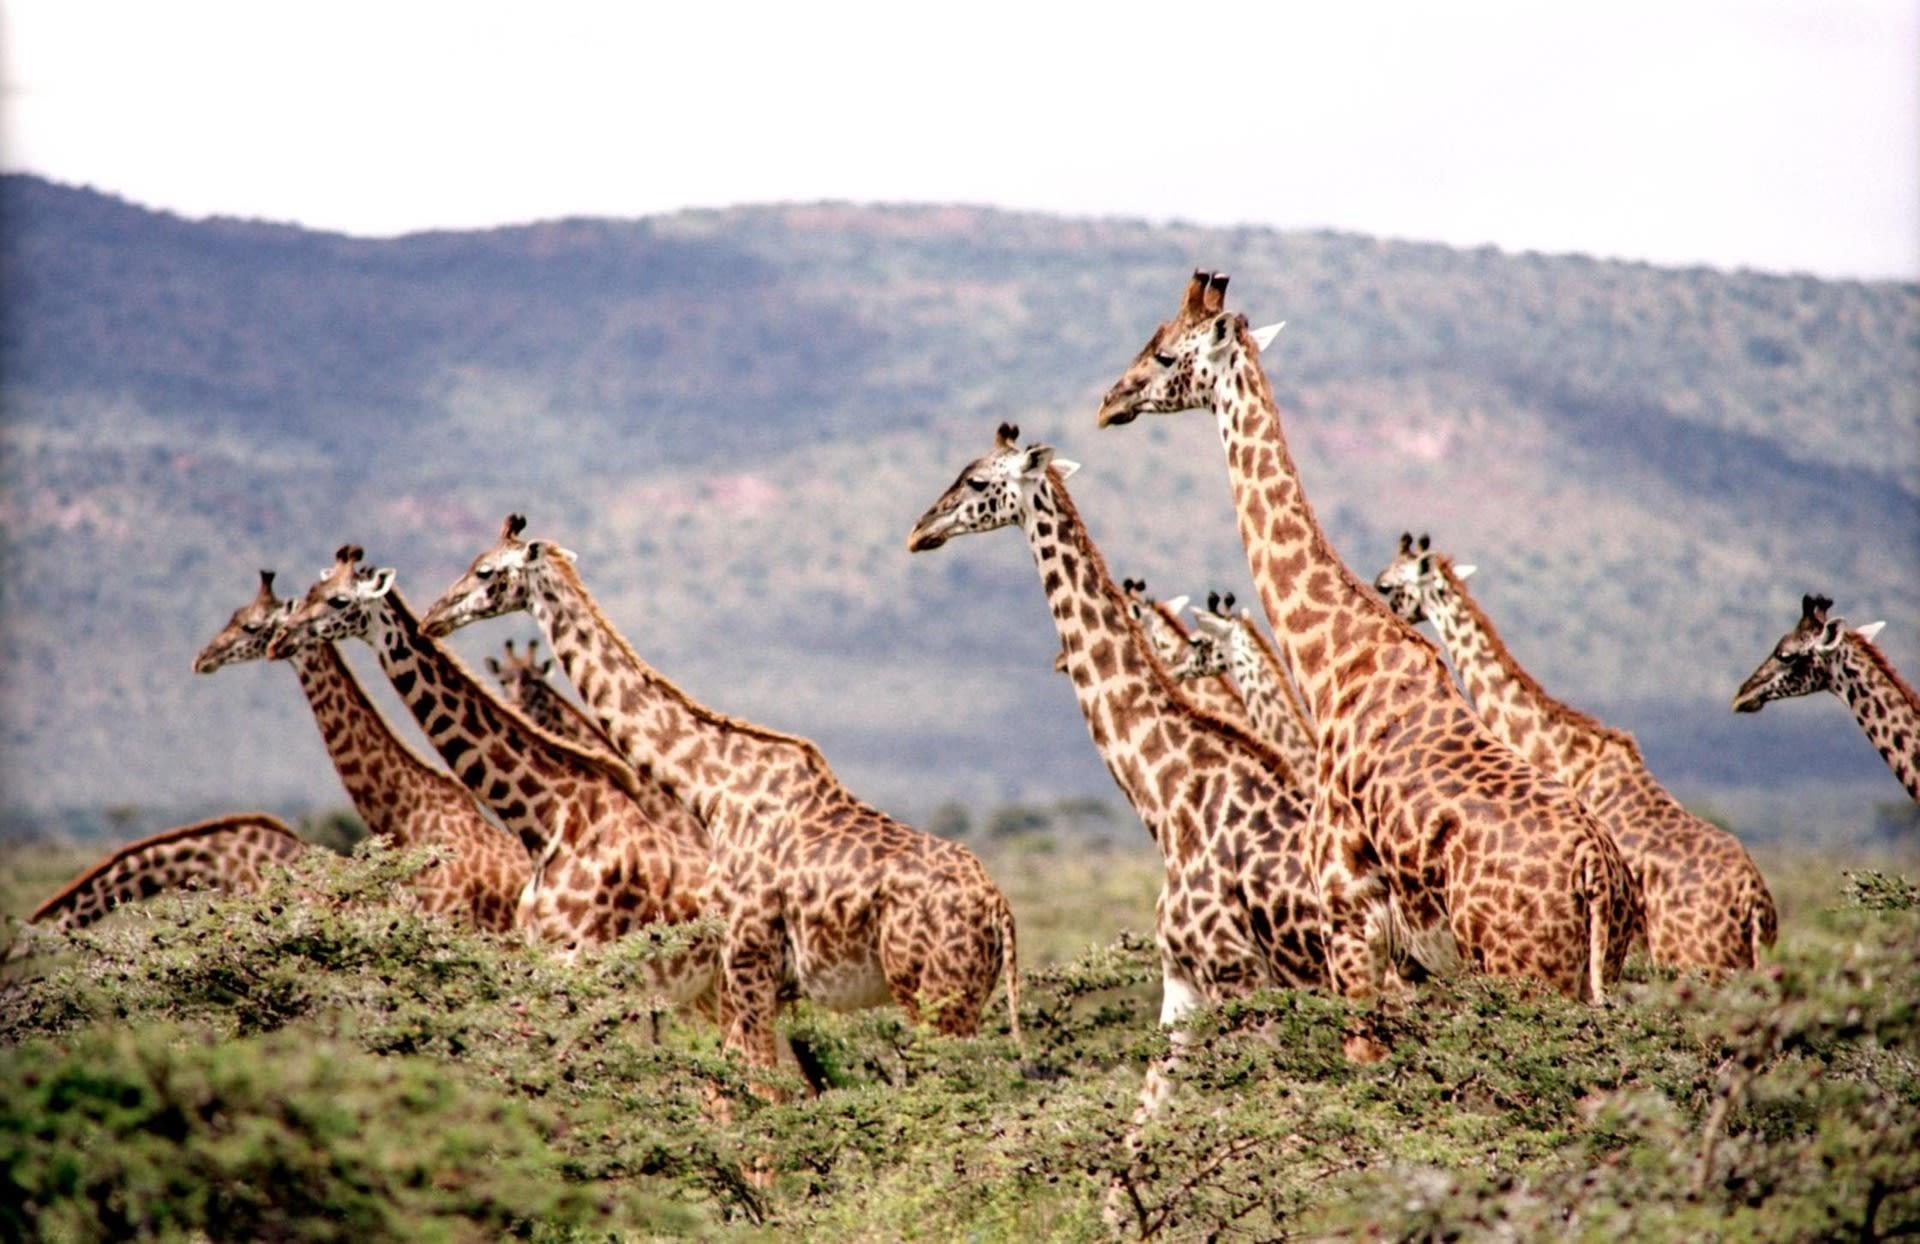 Giraffe Sighting in Banjul Safari Park